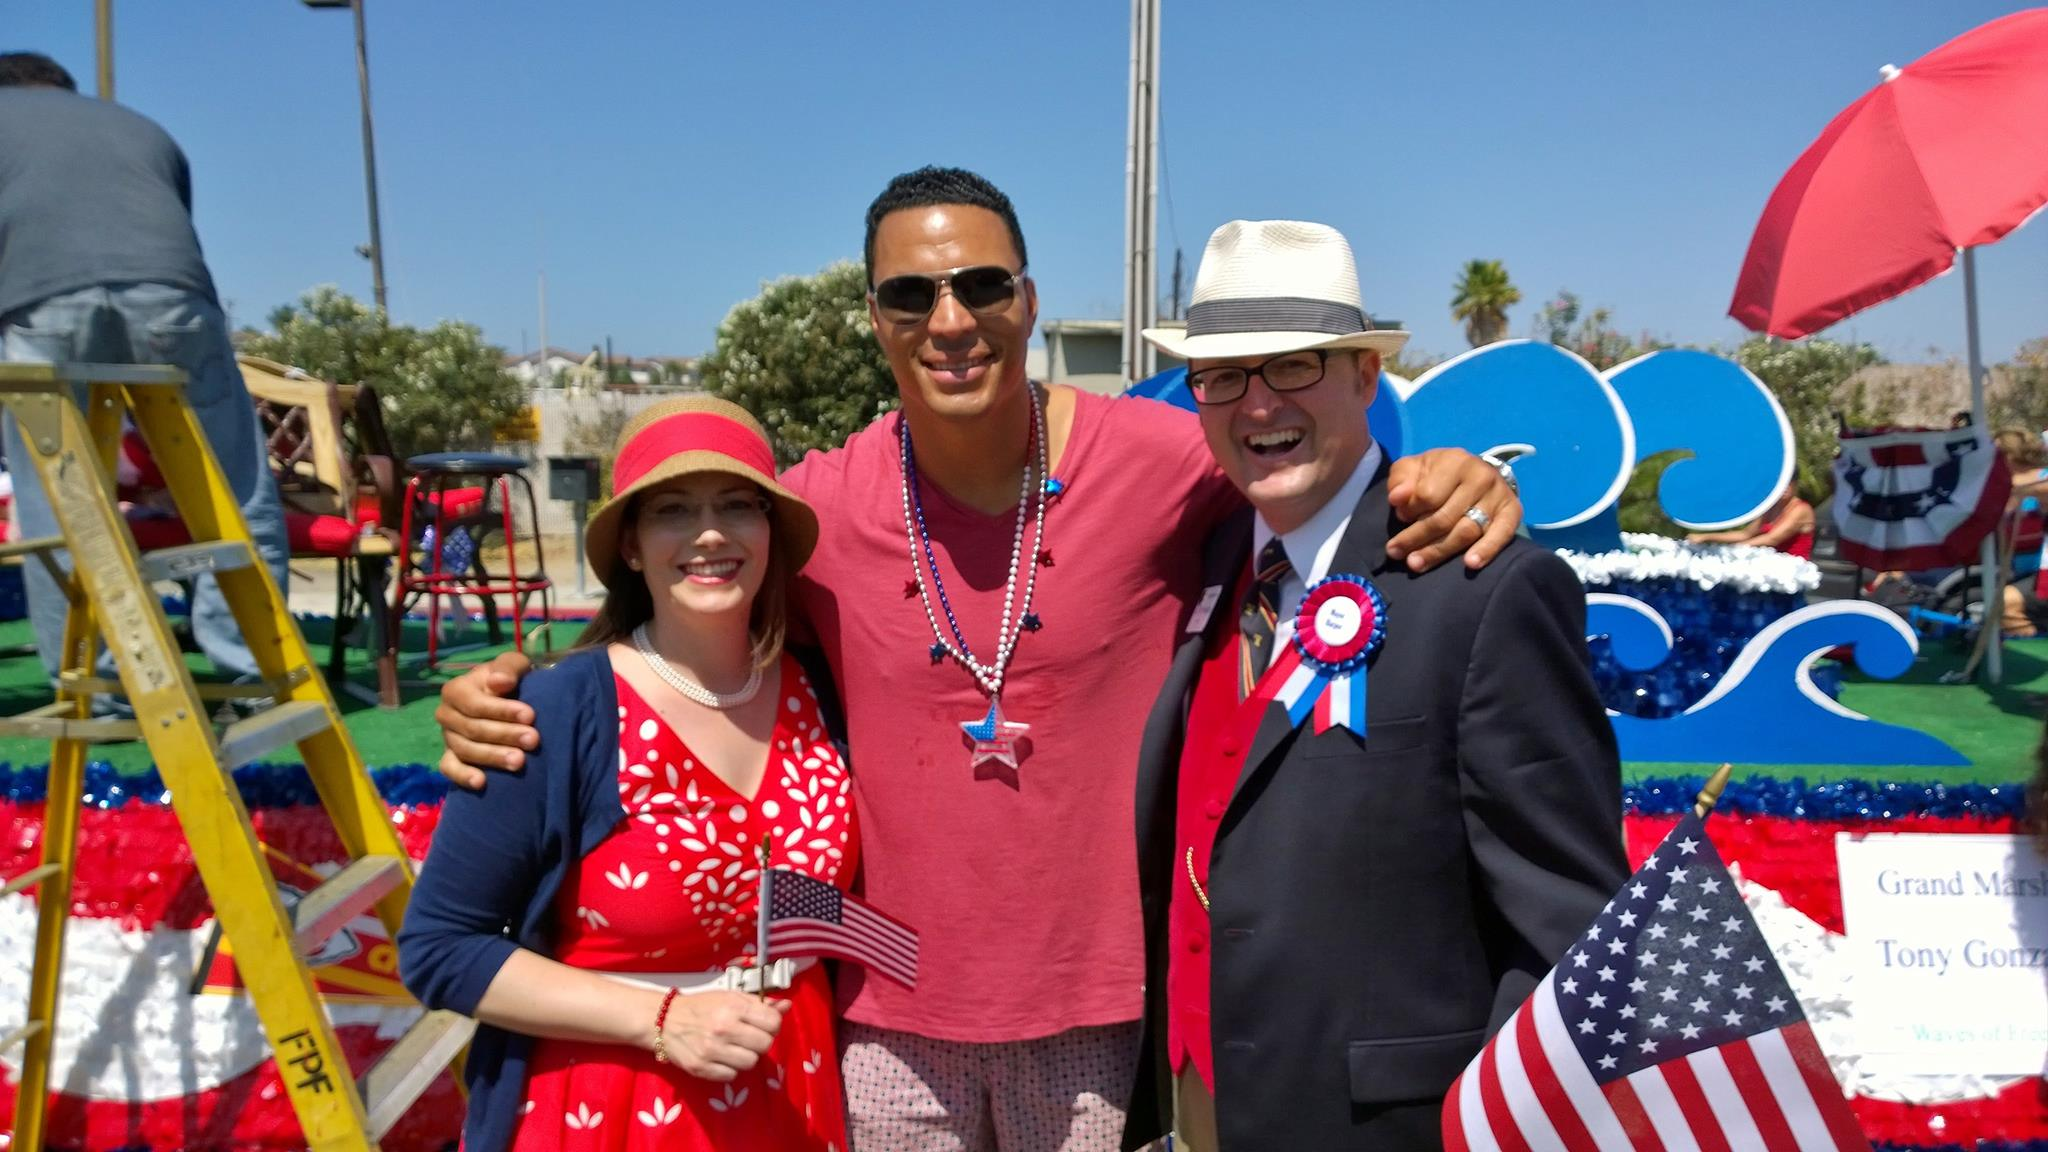 Huntington Beach Fourth of July